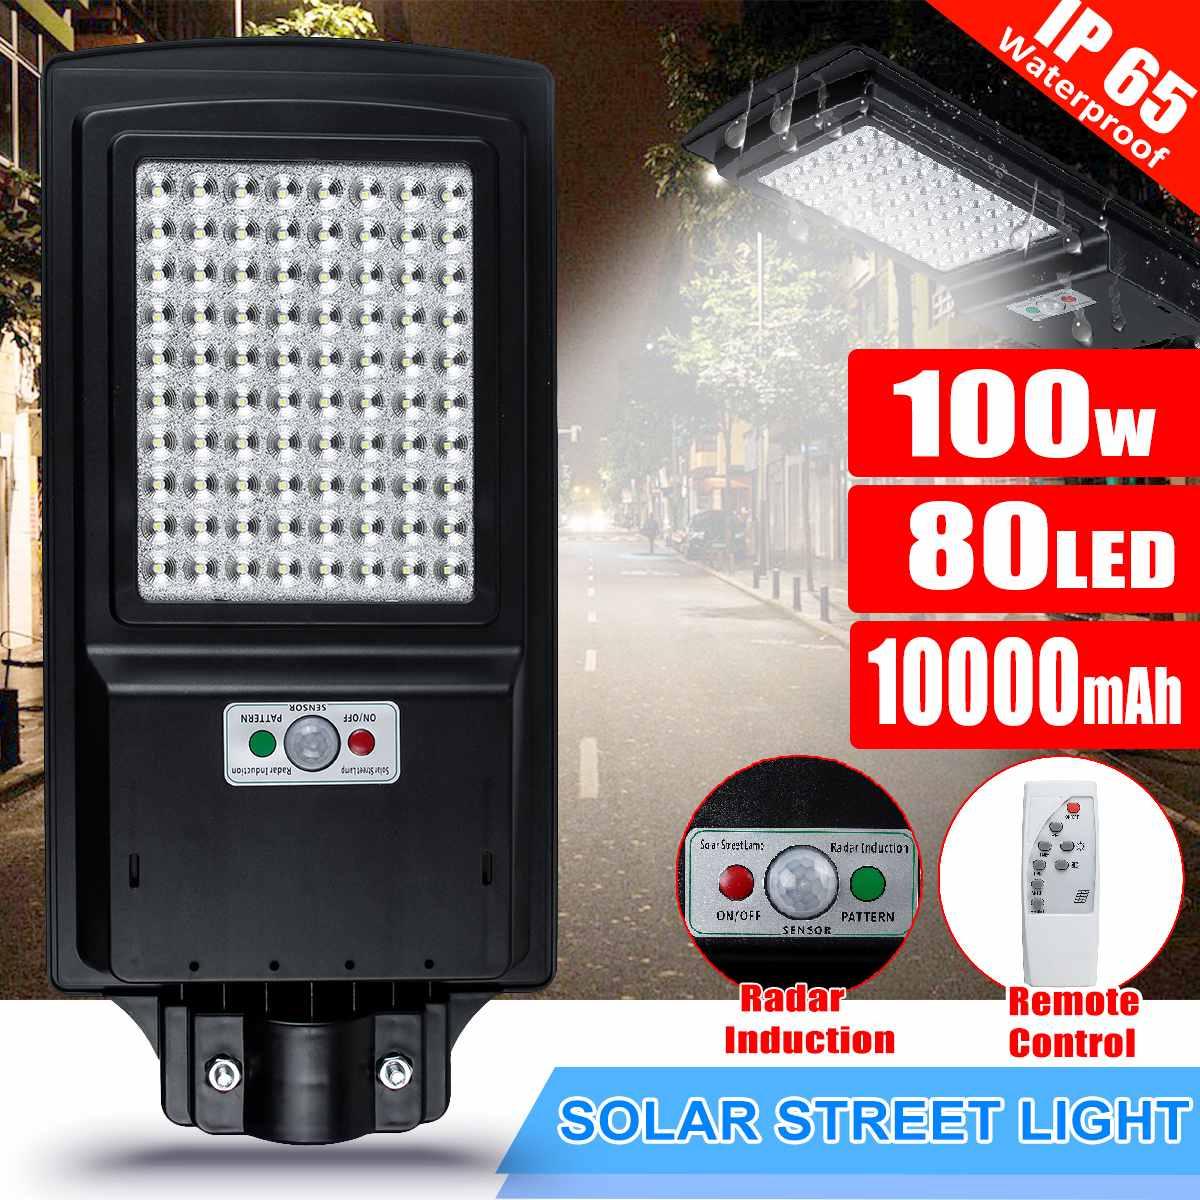 100W 80 LED Wall Lamp IP65 Solar Street Light Radar Motion 2 In 1 Constantly Bright & Induction Solar Sensor Remote Control